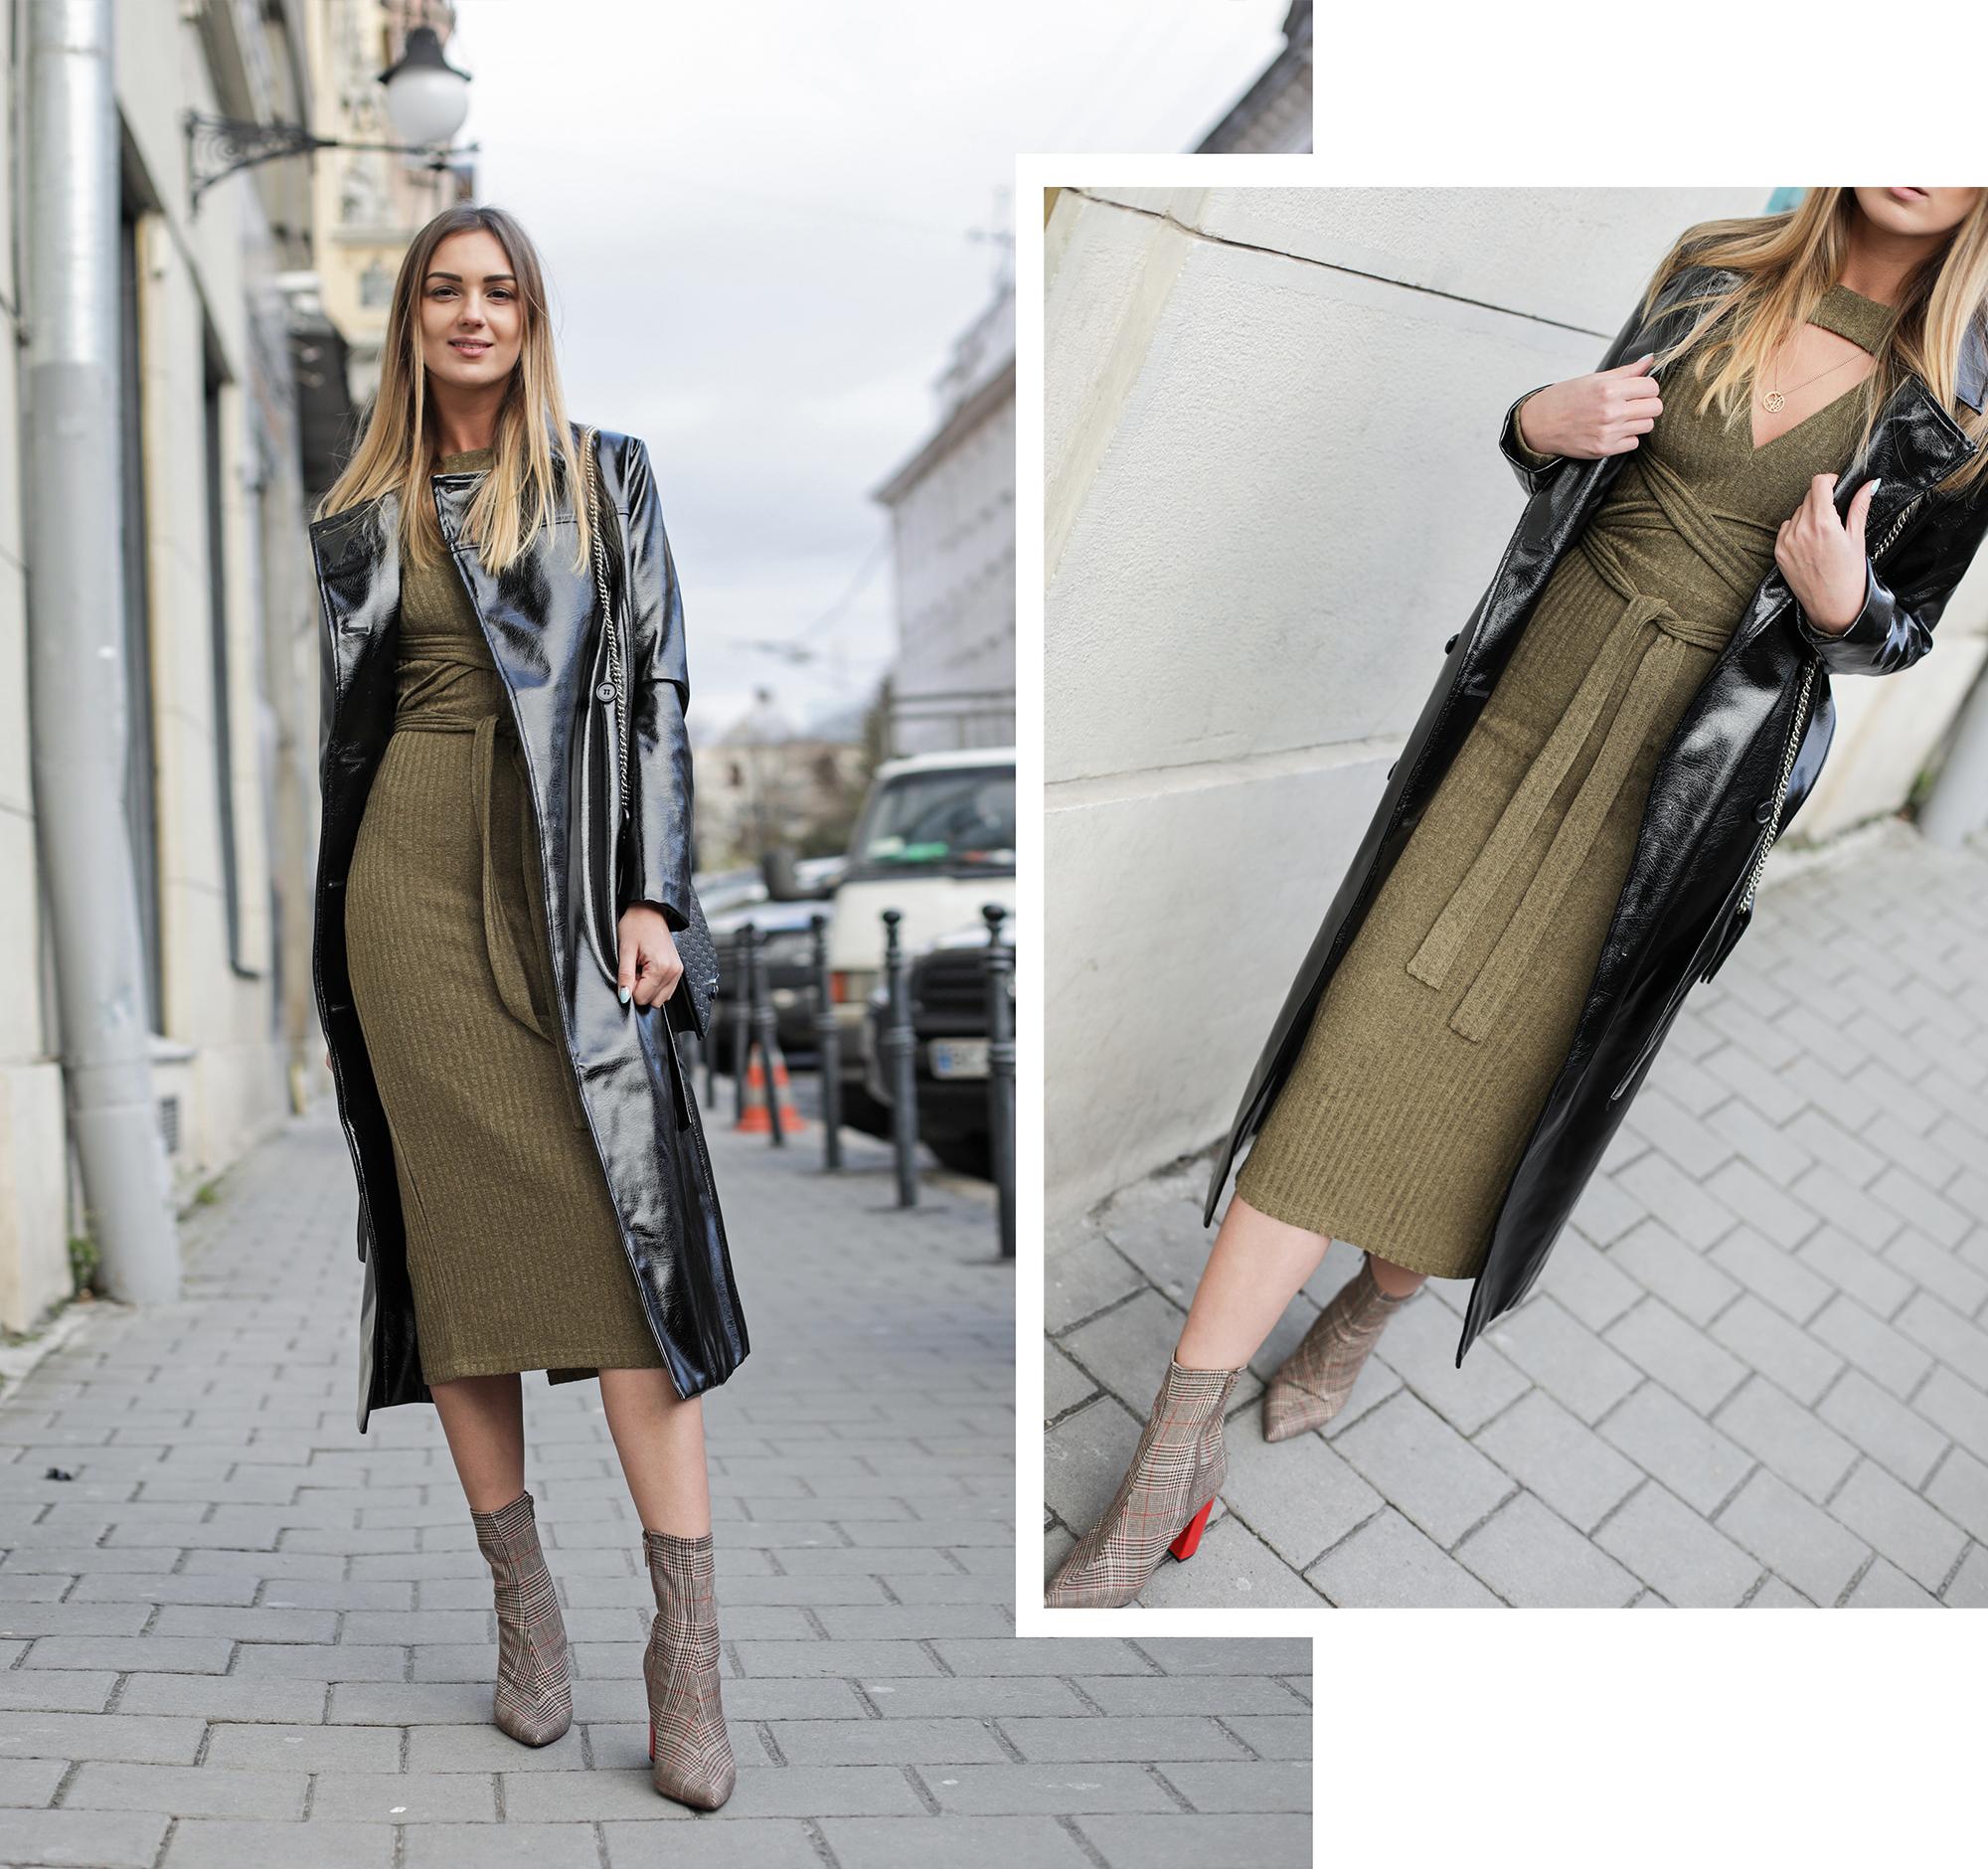 fashion-look-bodycon-dress-sock-boots